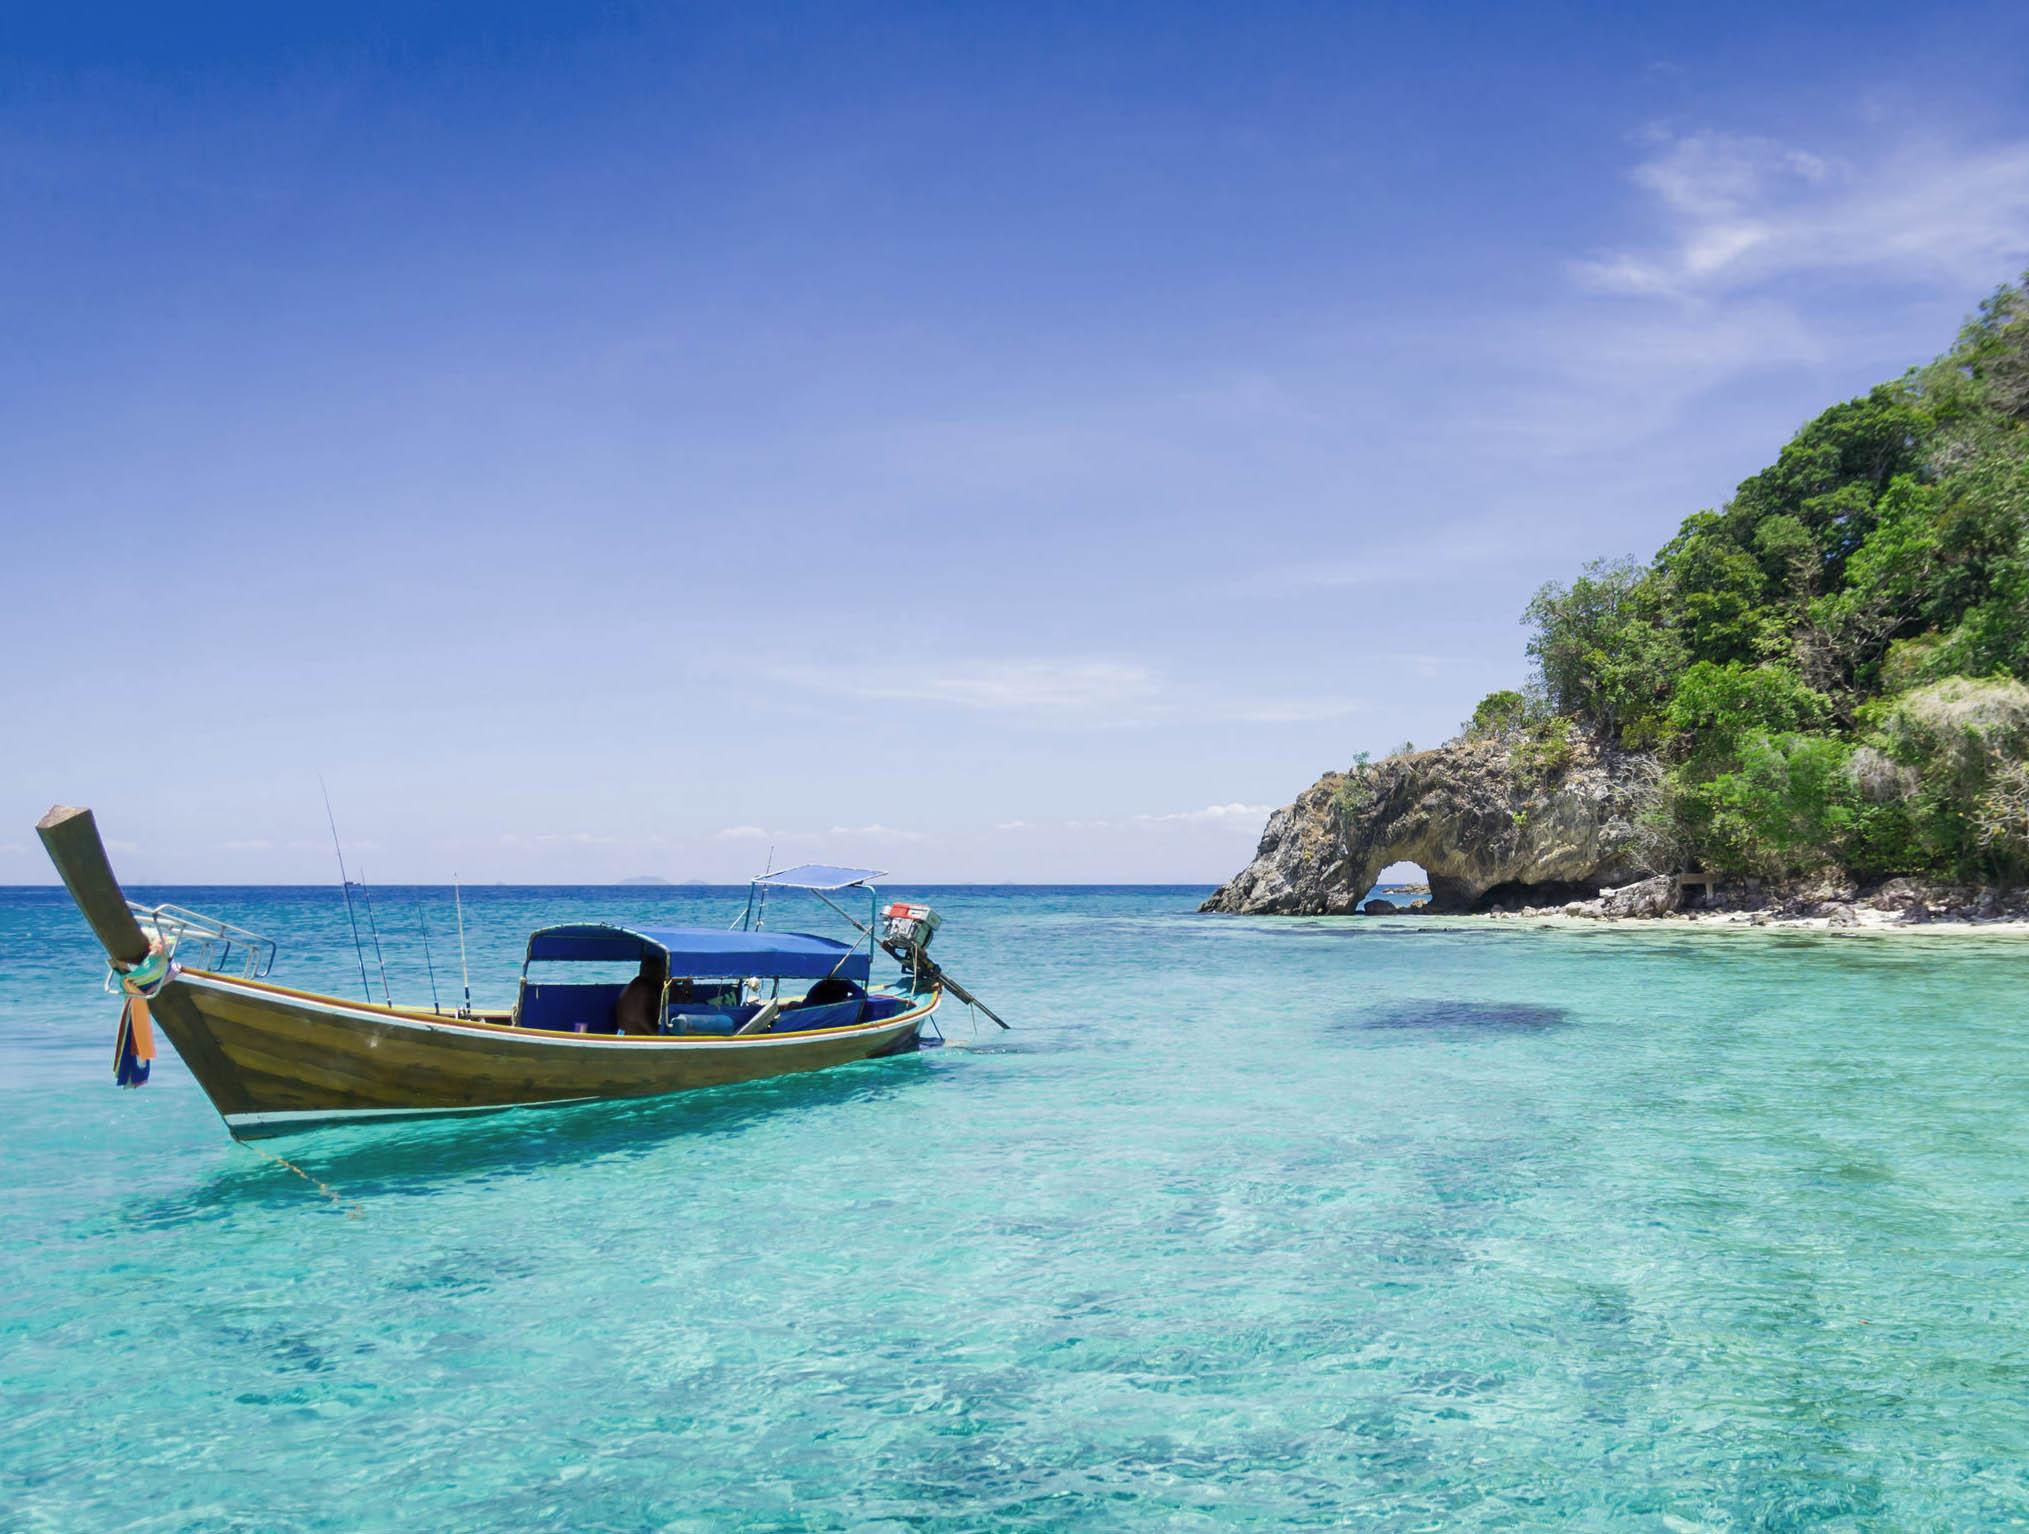 new zealand boat and island 123rf